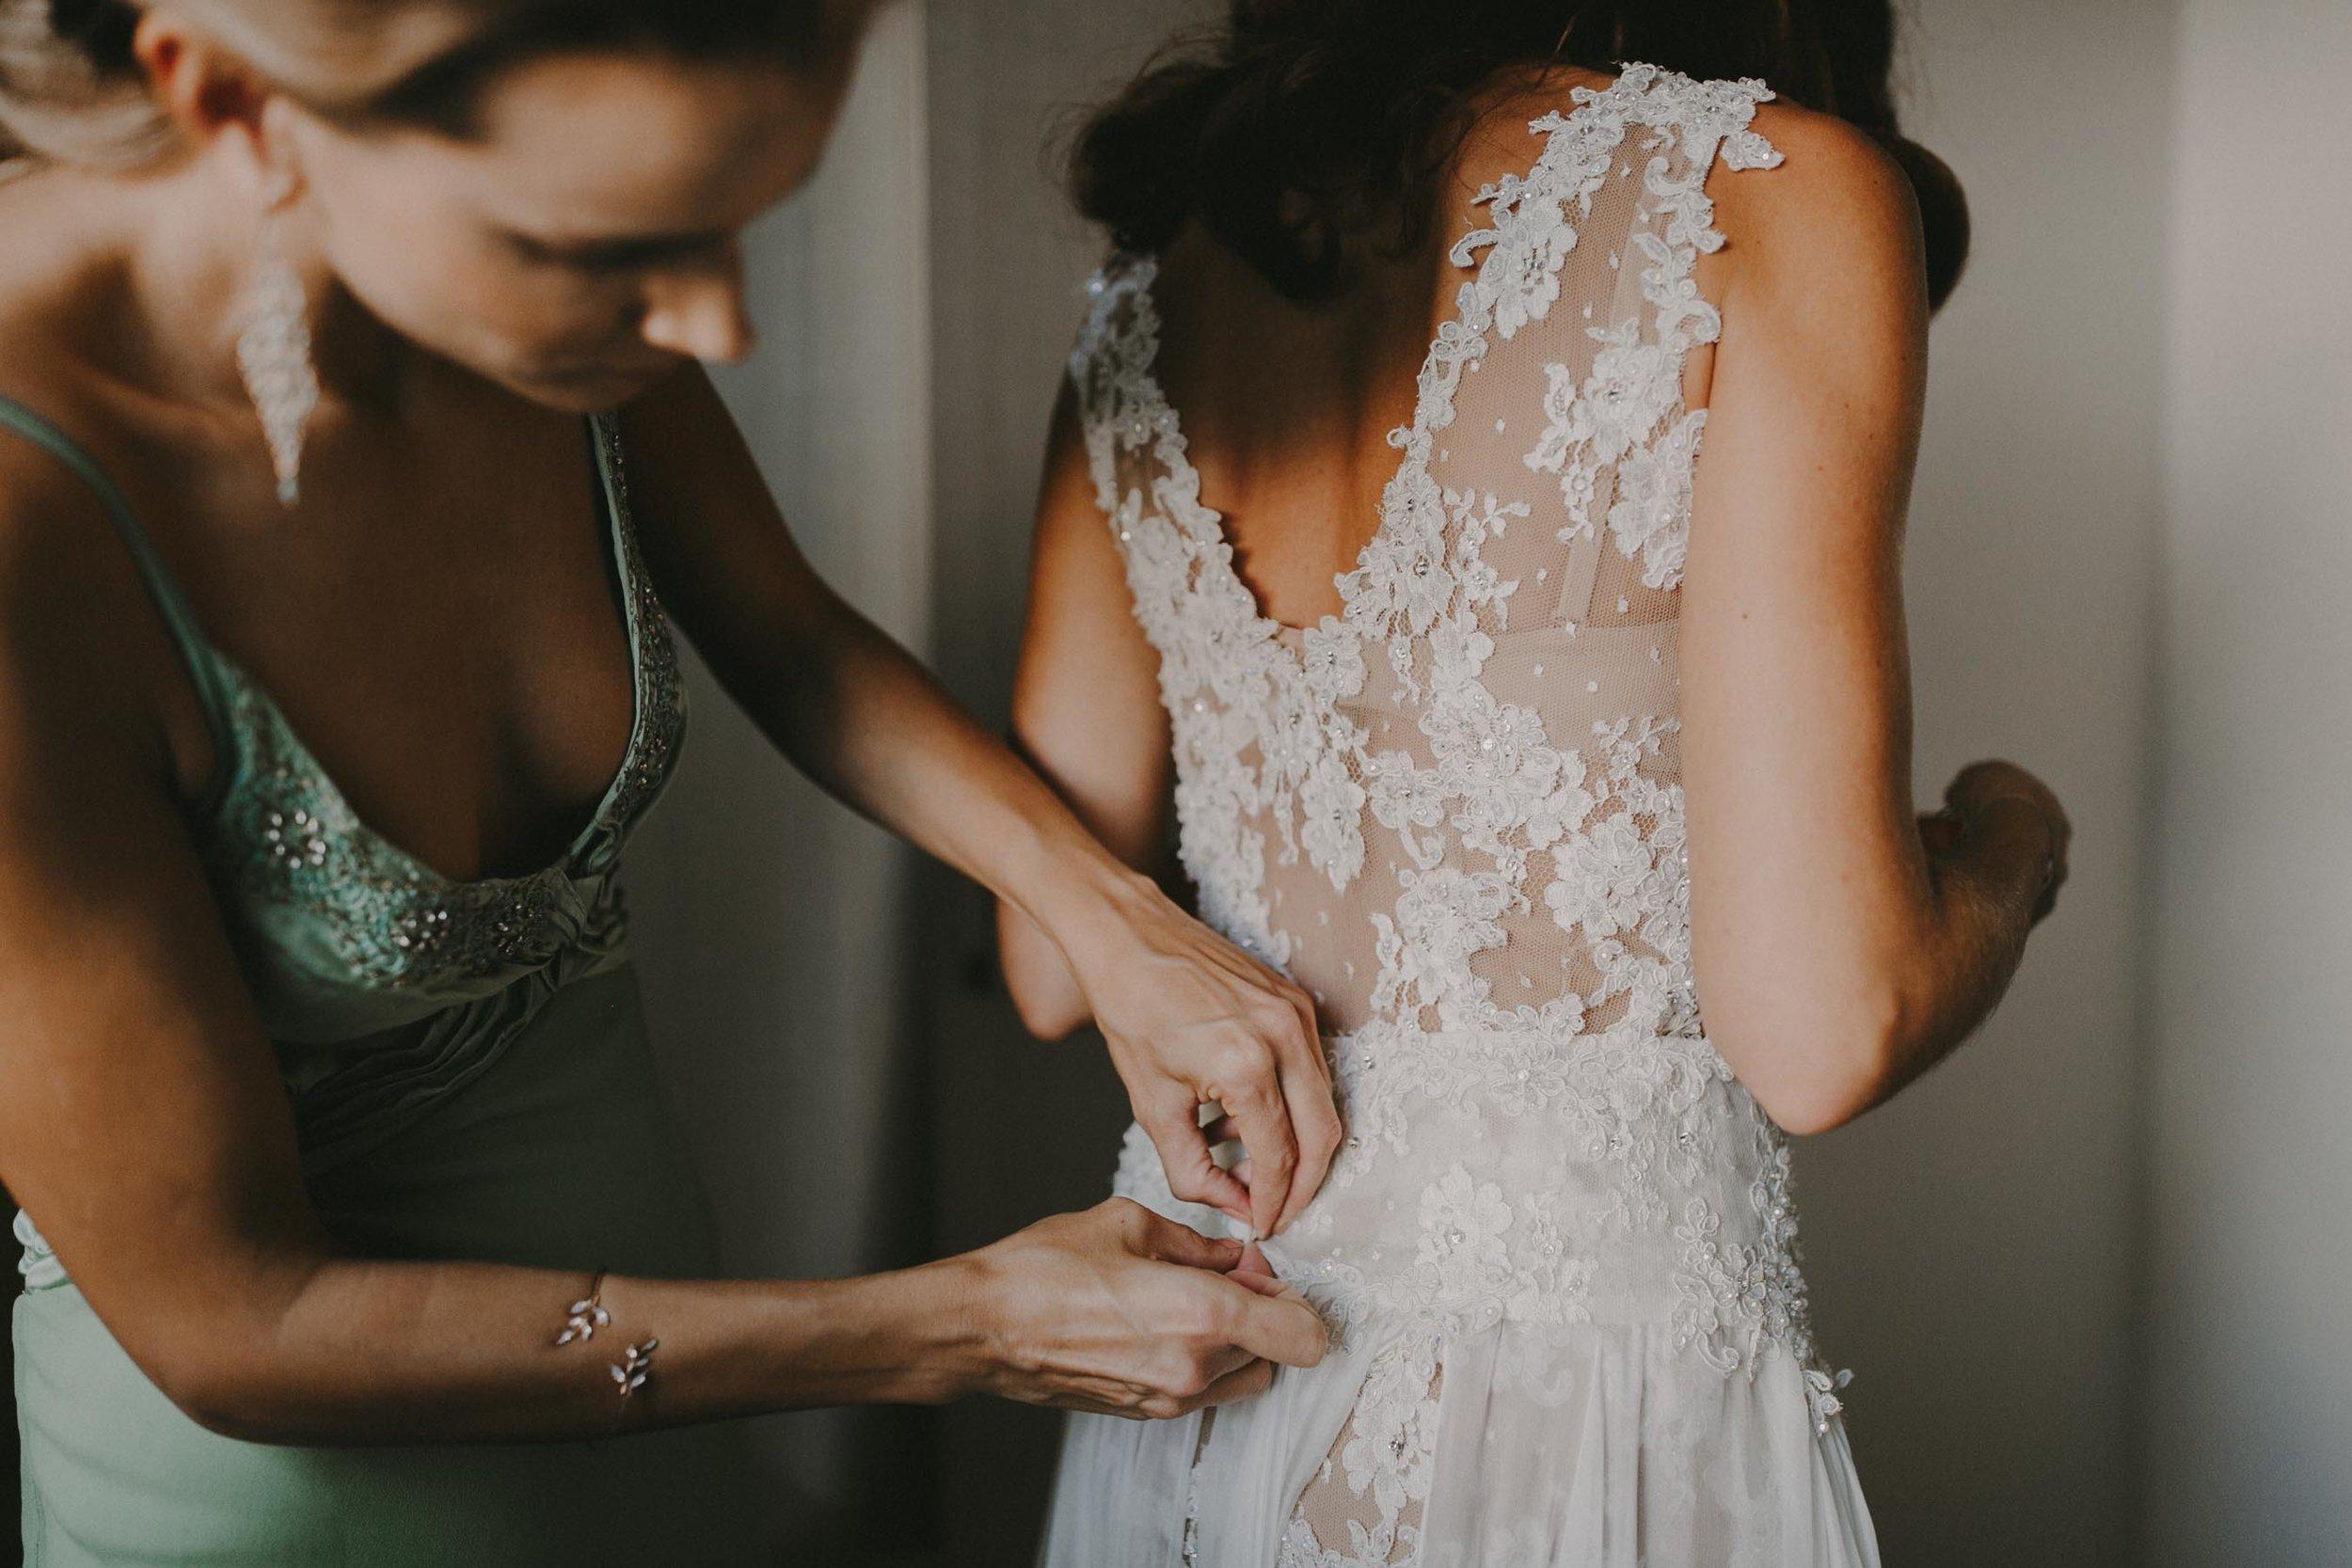 sylvia&dimitri-Wedding-Crvena_Luka-Croatia-33(7581).jpg